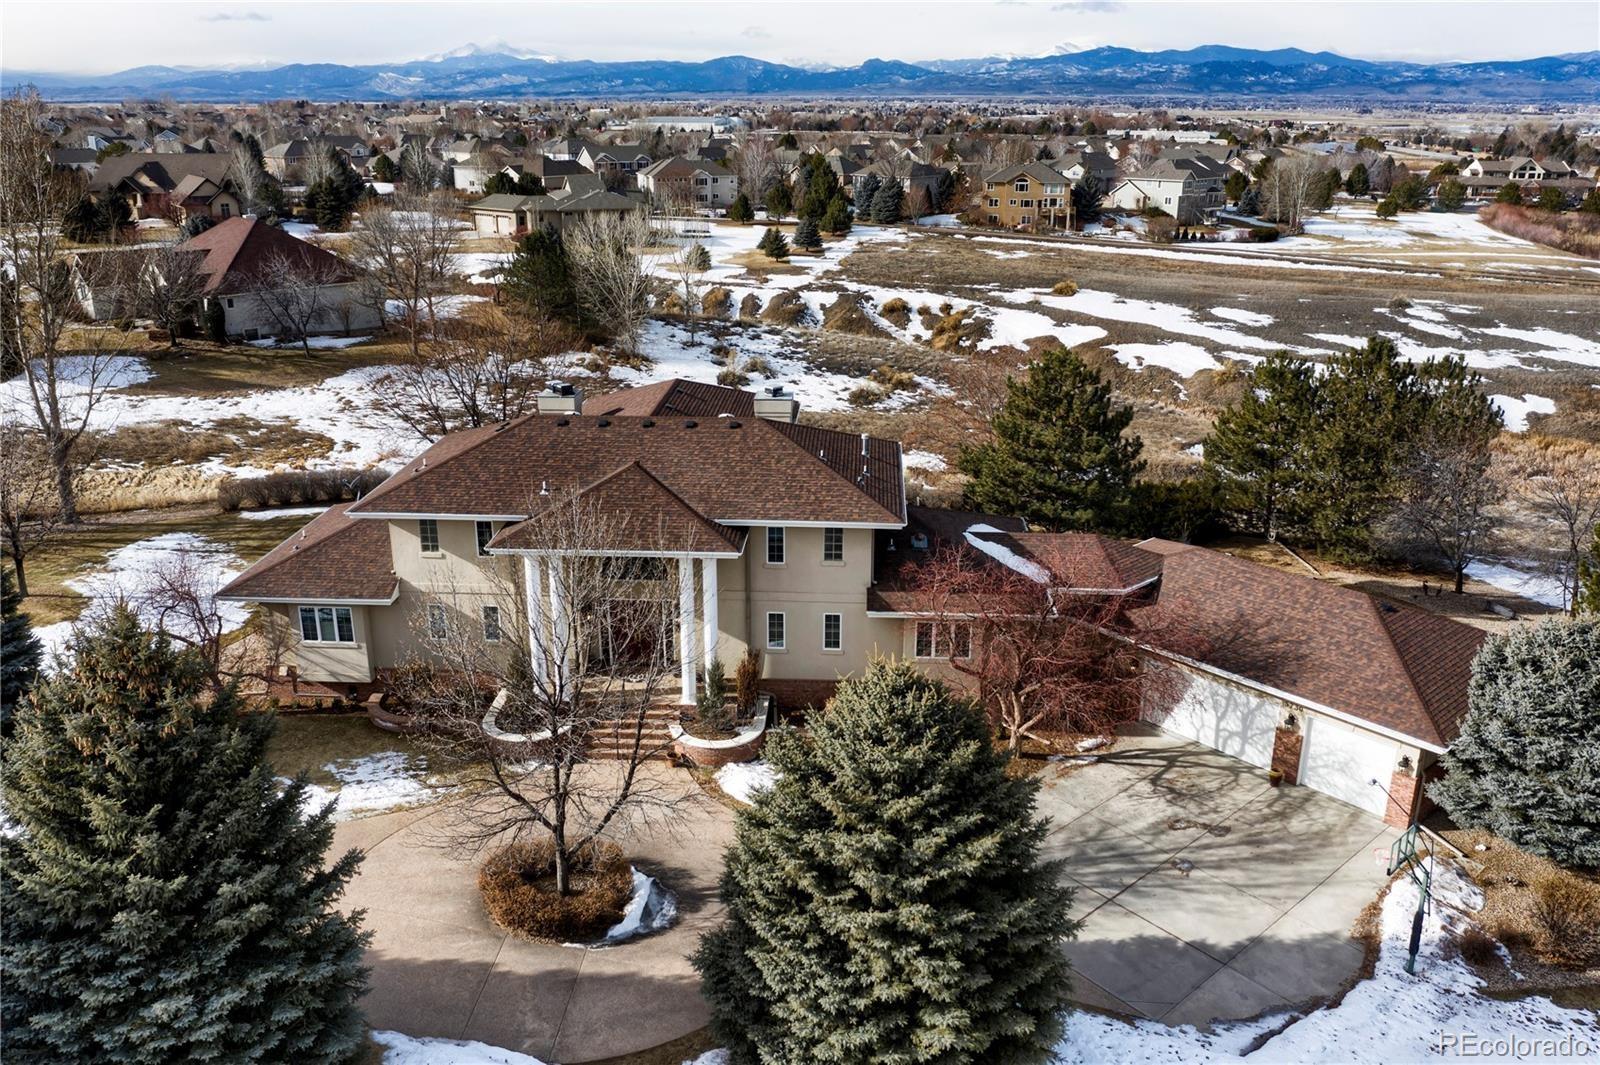 MLS# 2964584 - 1 - 5730 Ridgeway Drive, Fort Collins, CO 80528